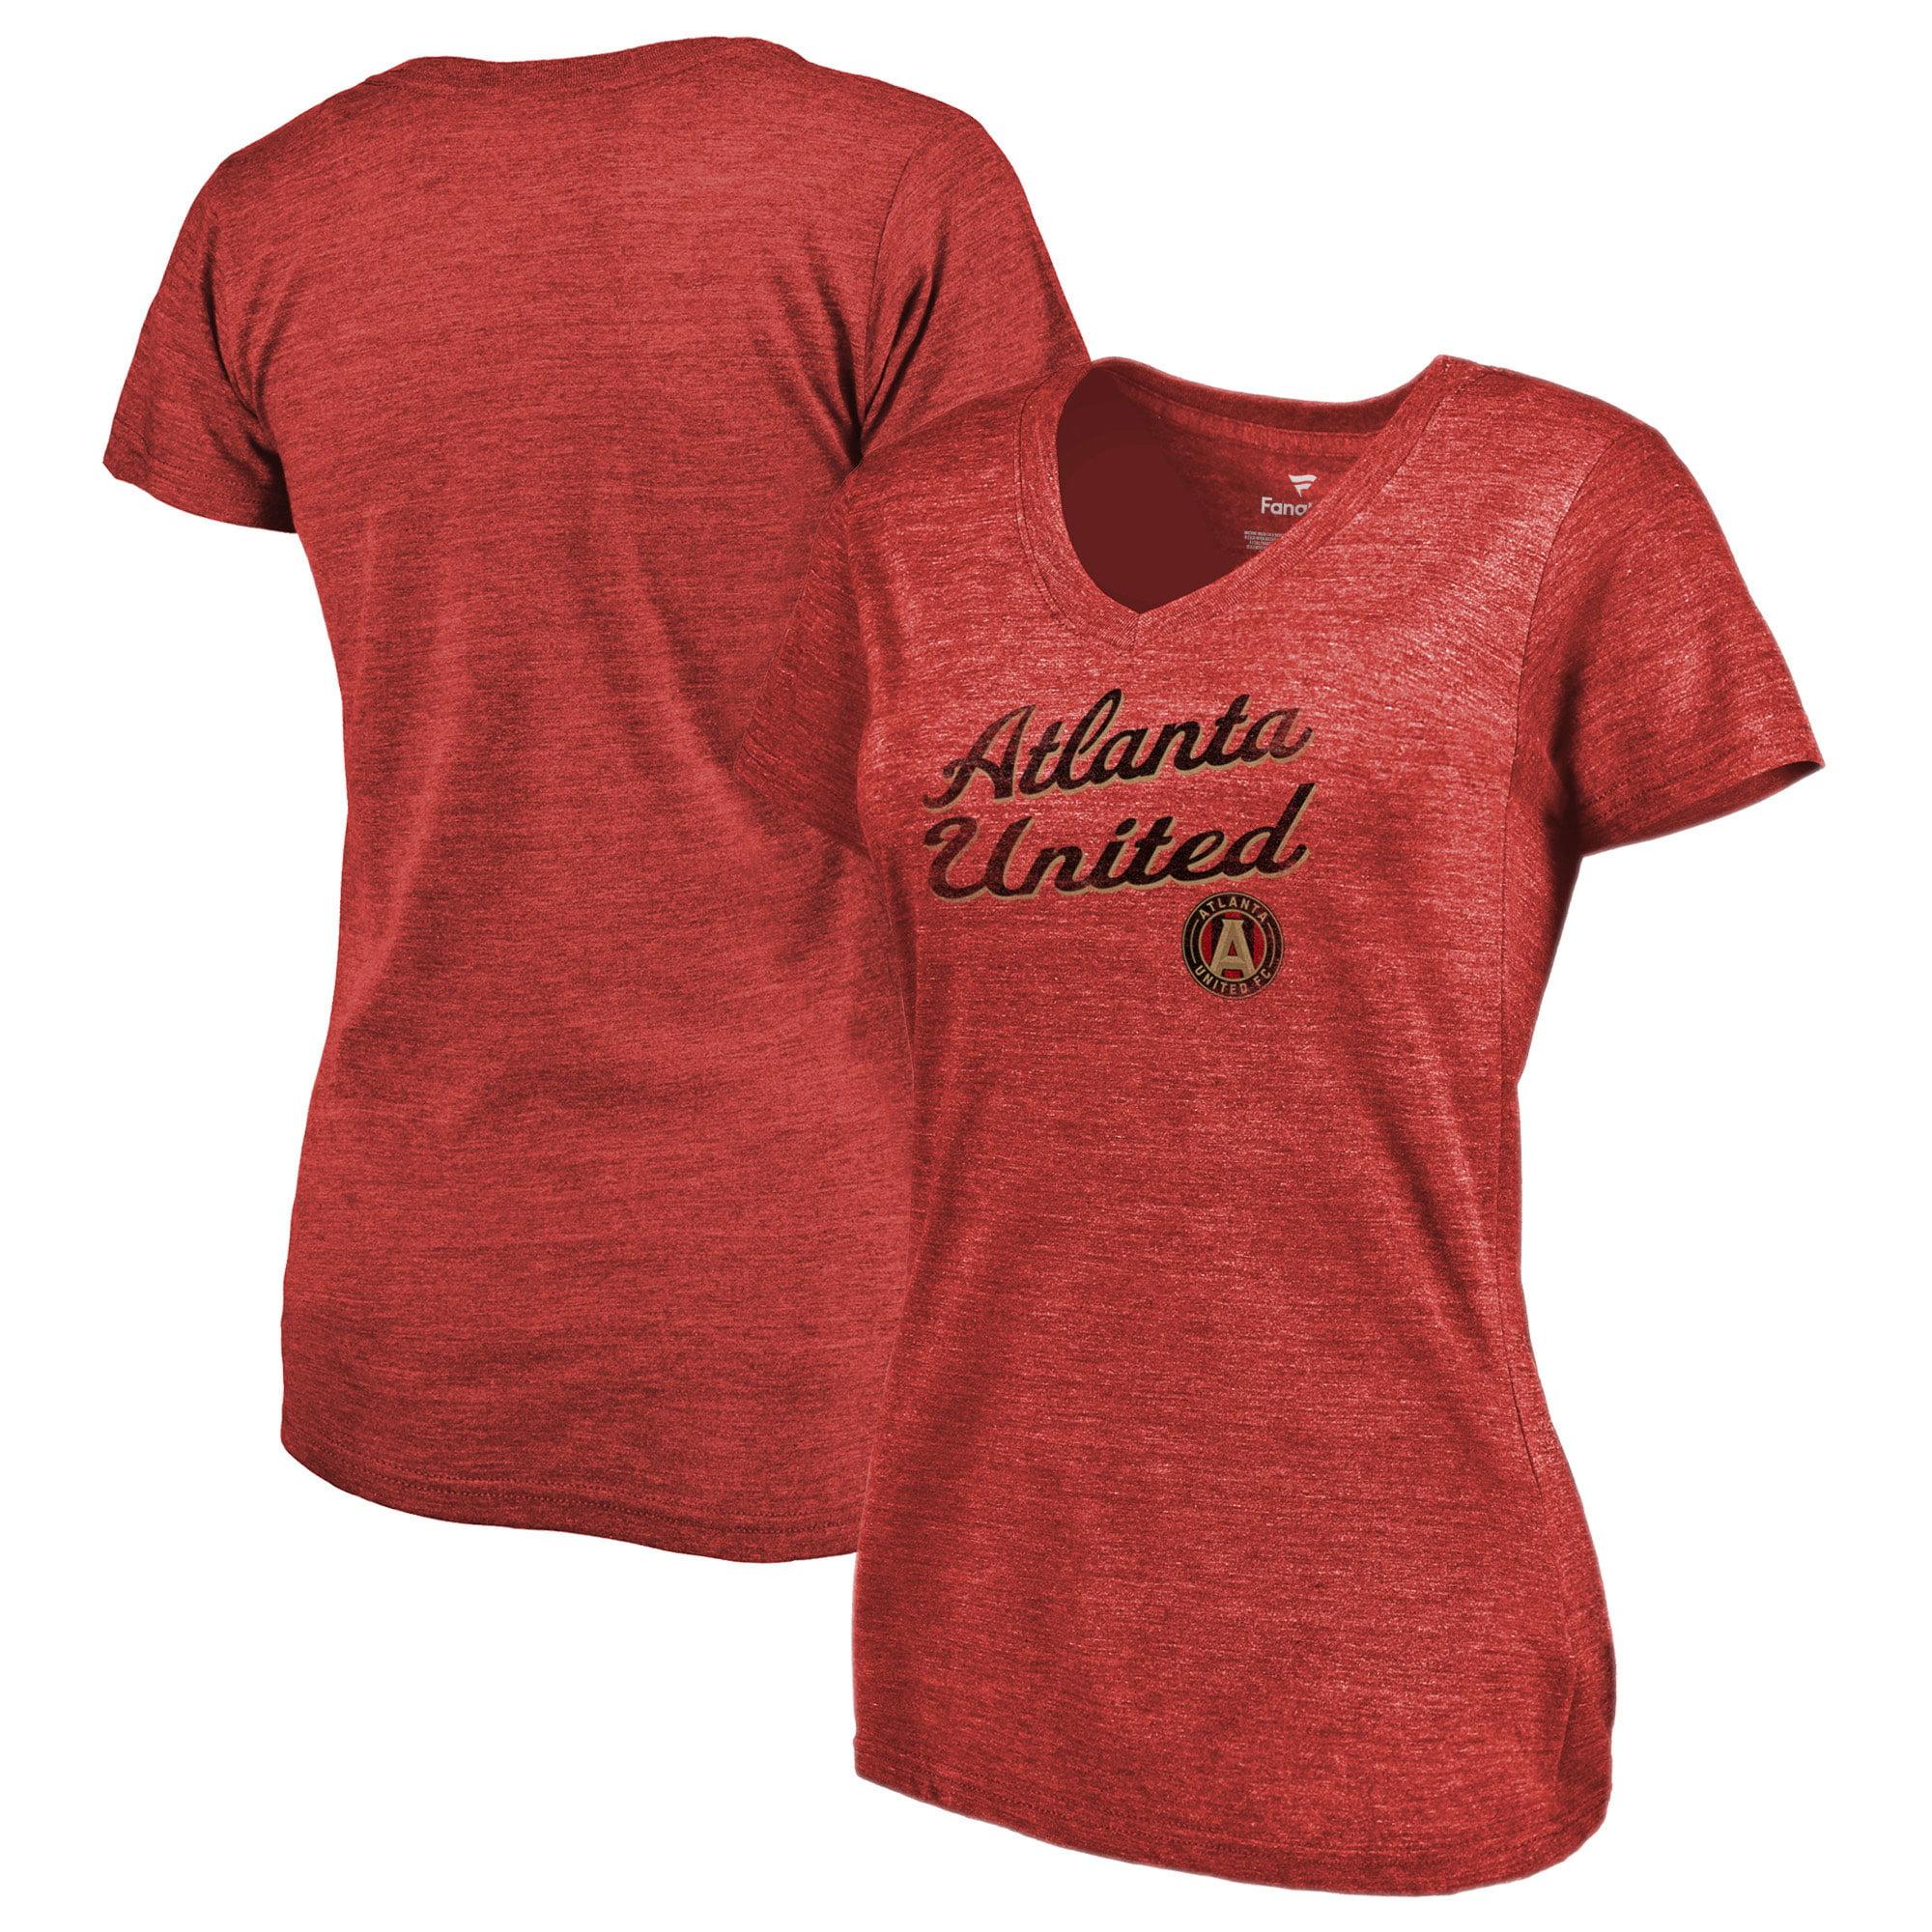 Atlanta United FC Fanatics Branded Women's Rising Script V-Neck Tri-Blend T-Shirt - Heathered Red